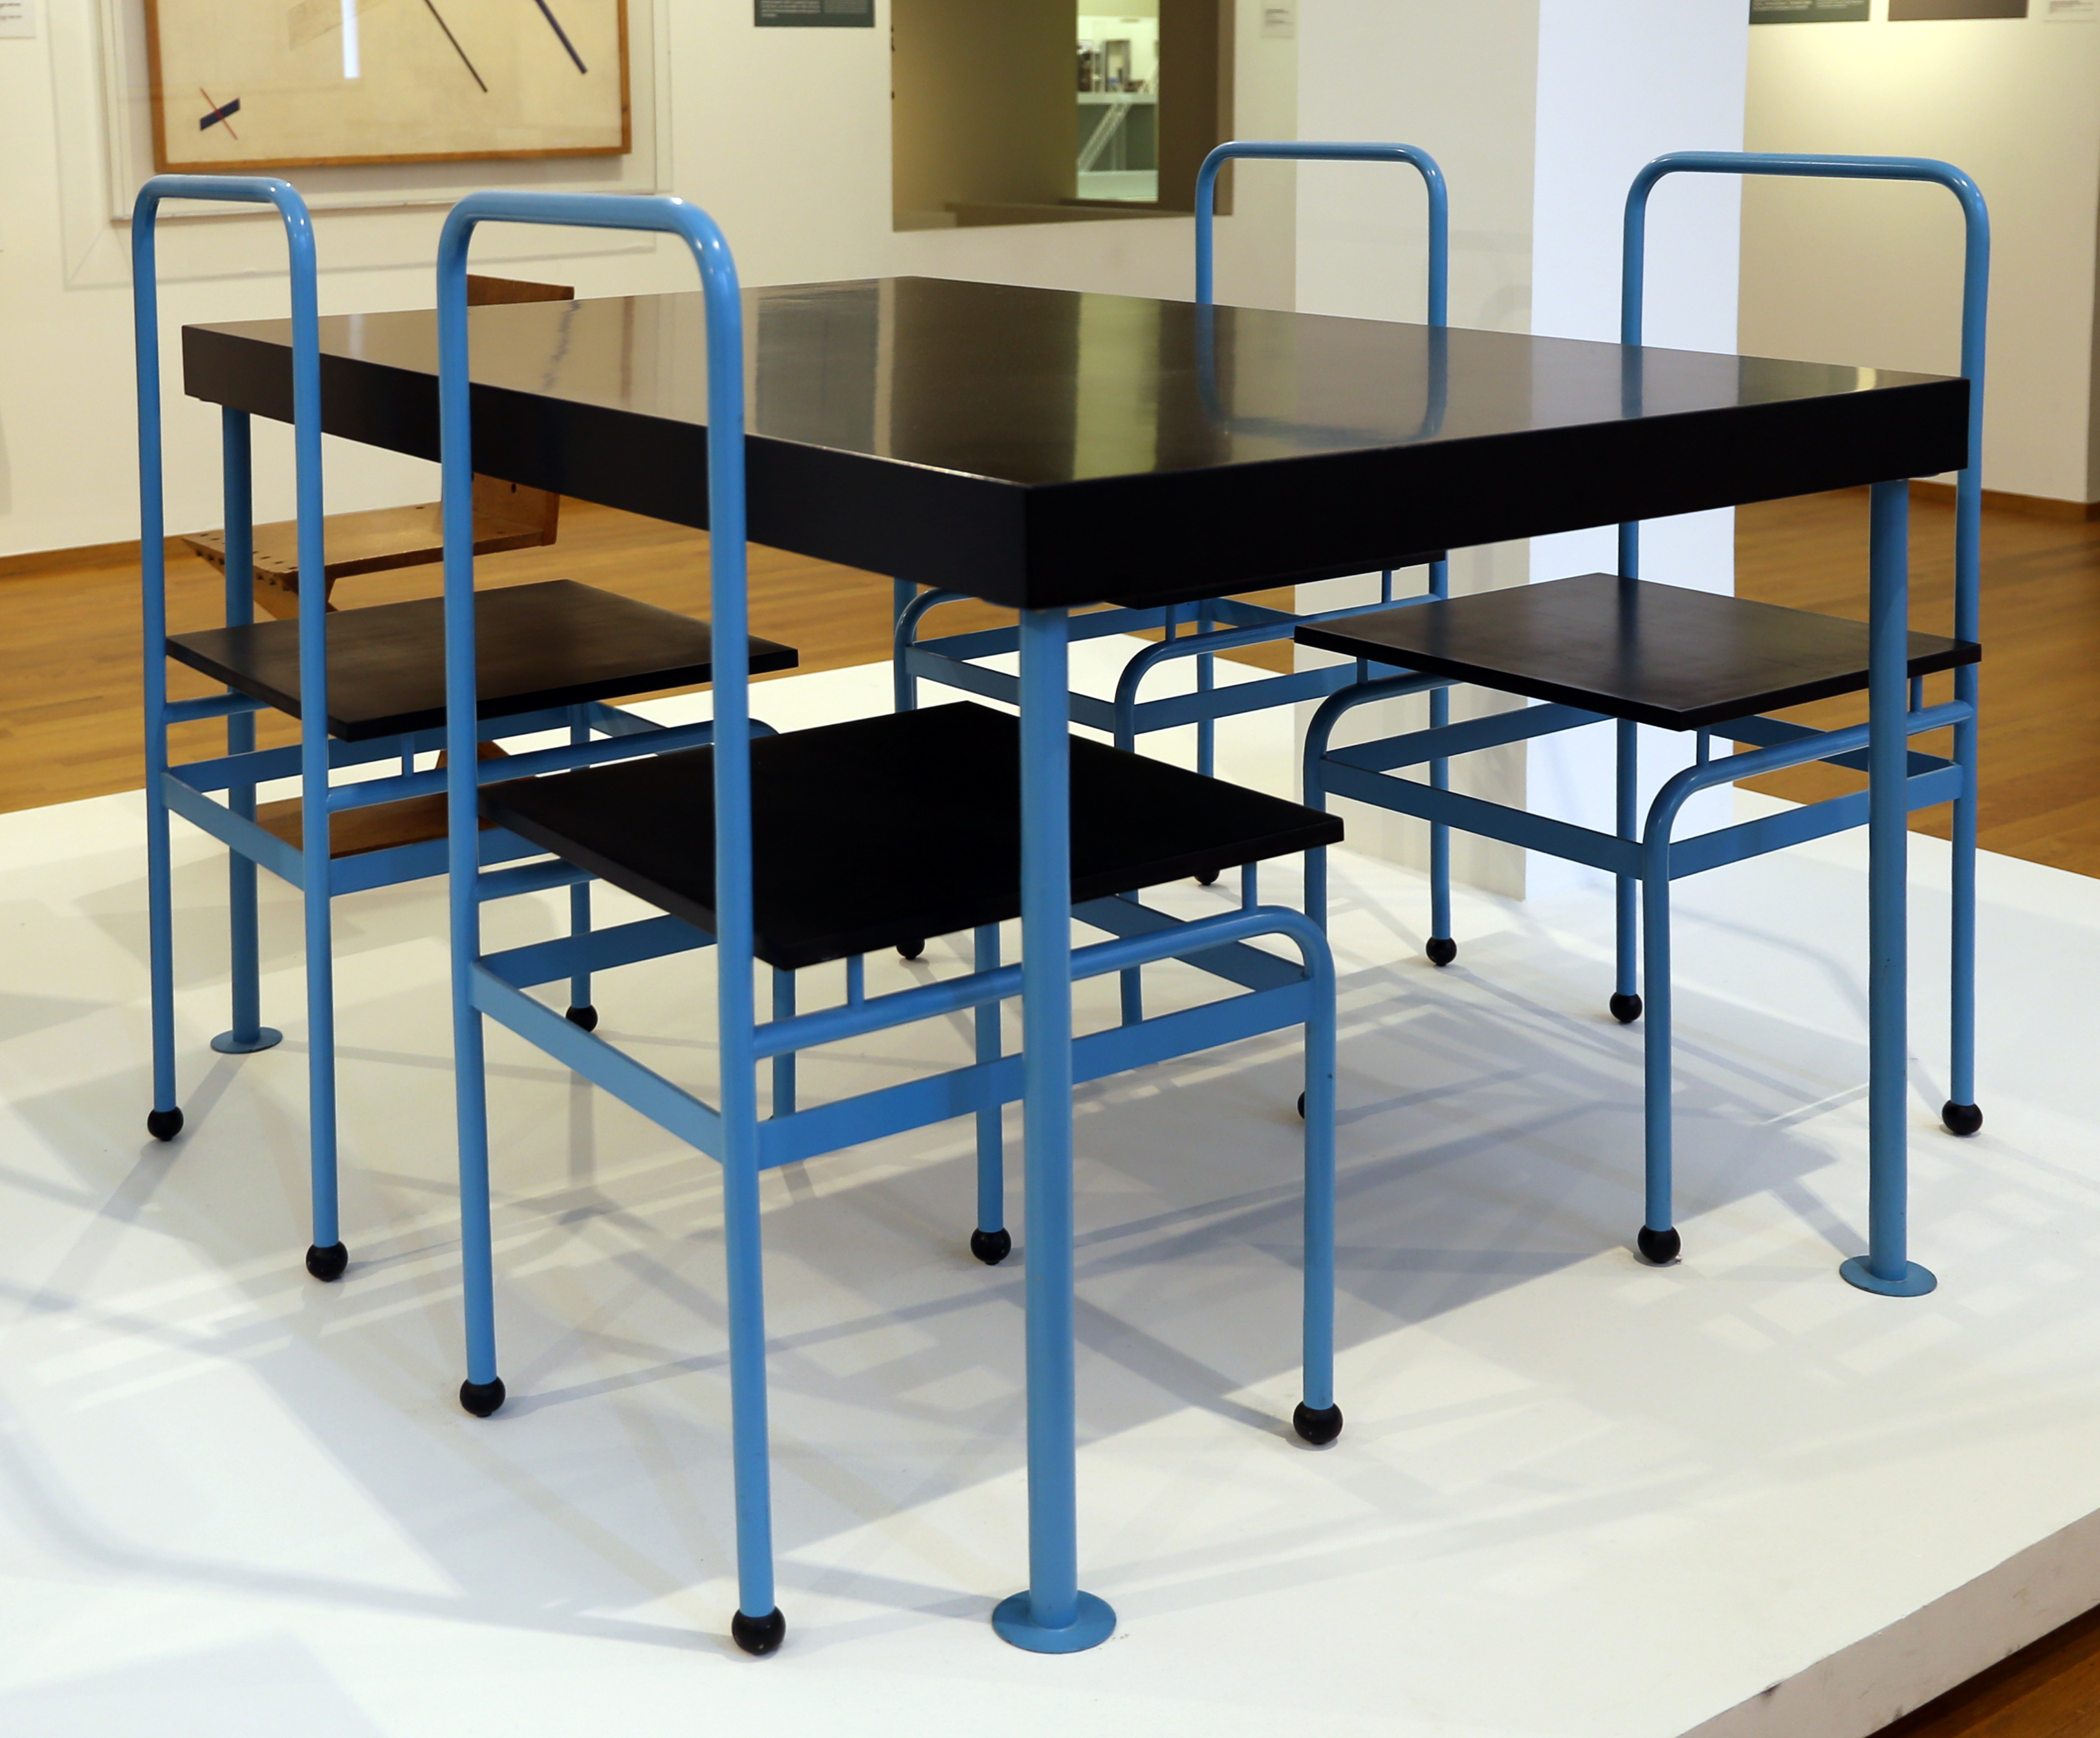 Tavoli Da Cucina Design.File J J P Oud Tavolo Da Cucina E Sedie Per Il